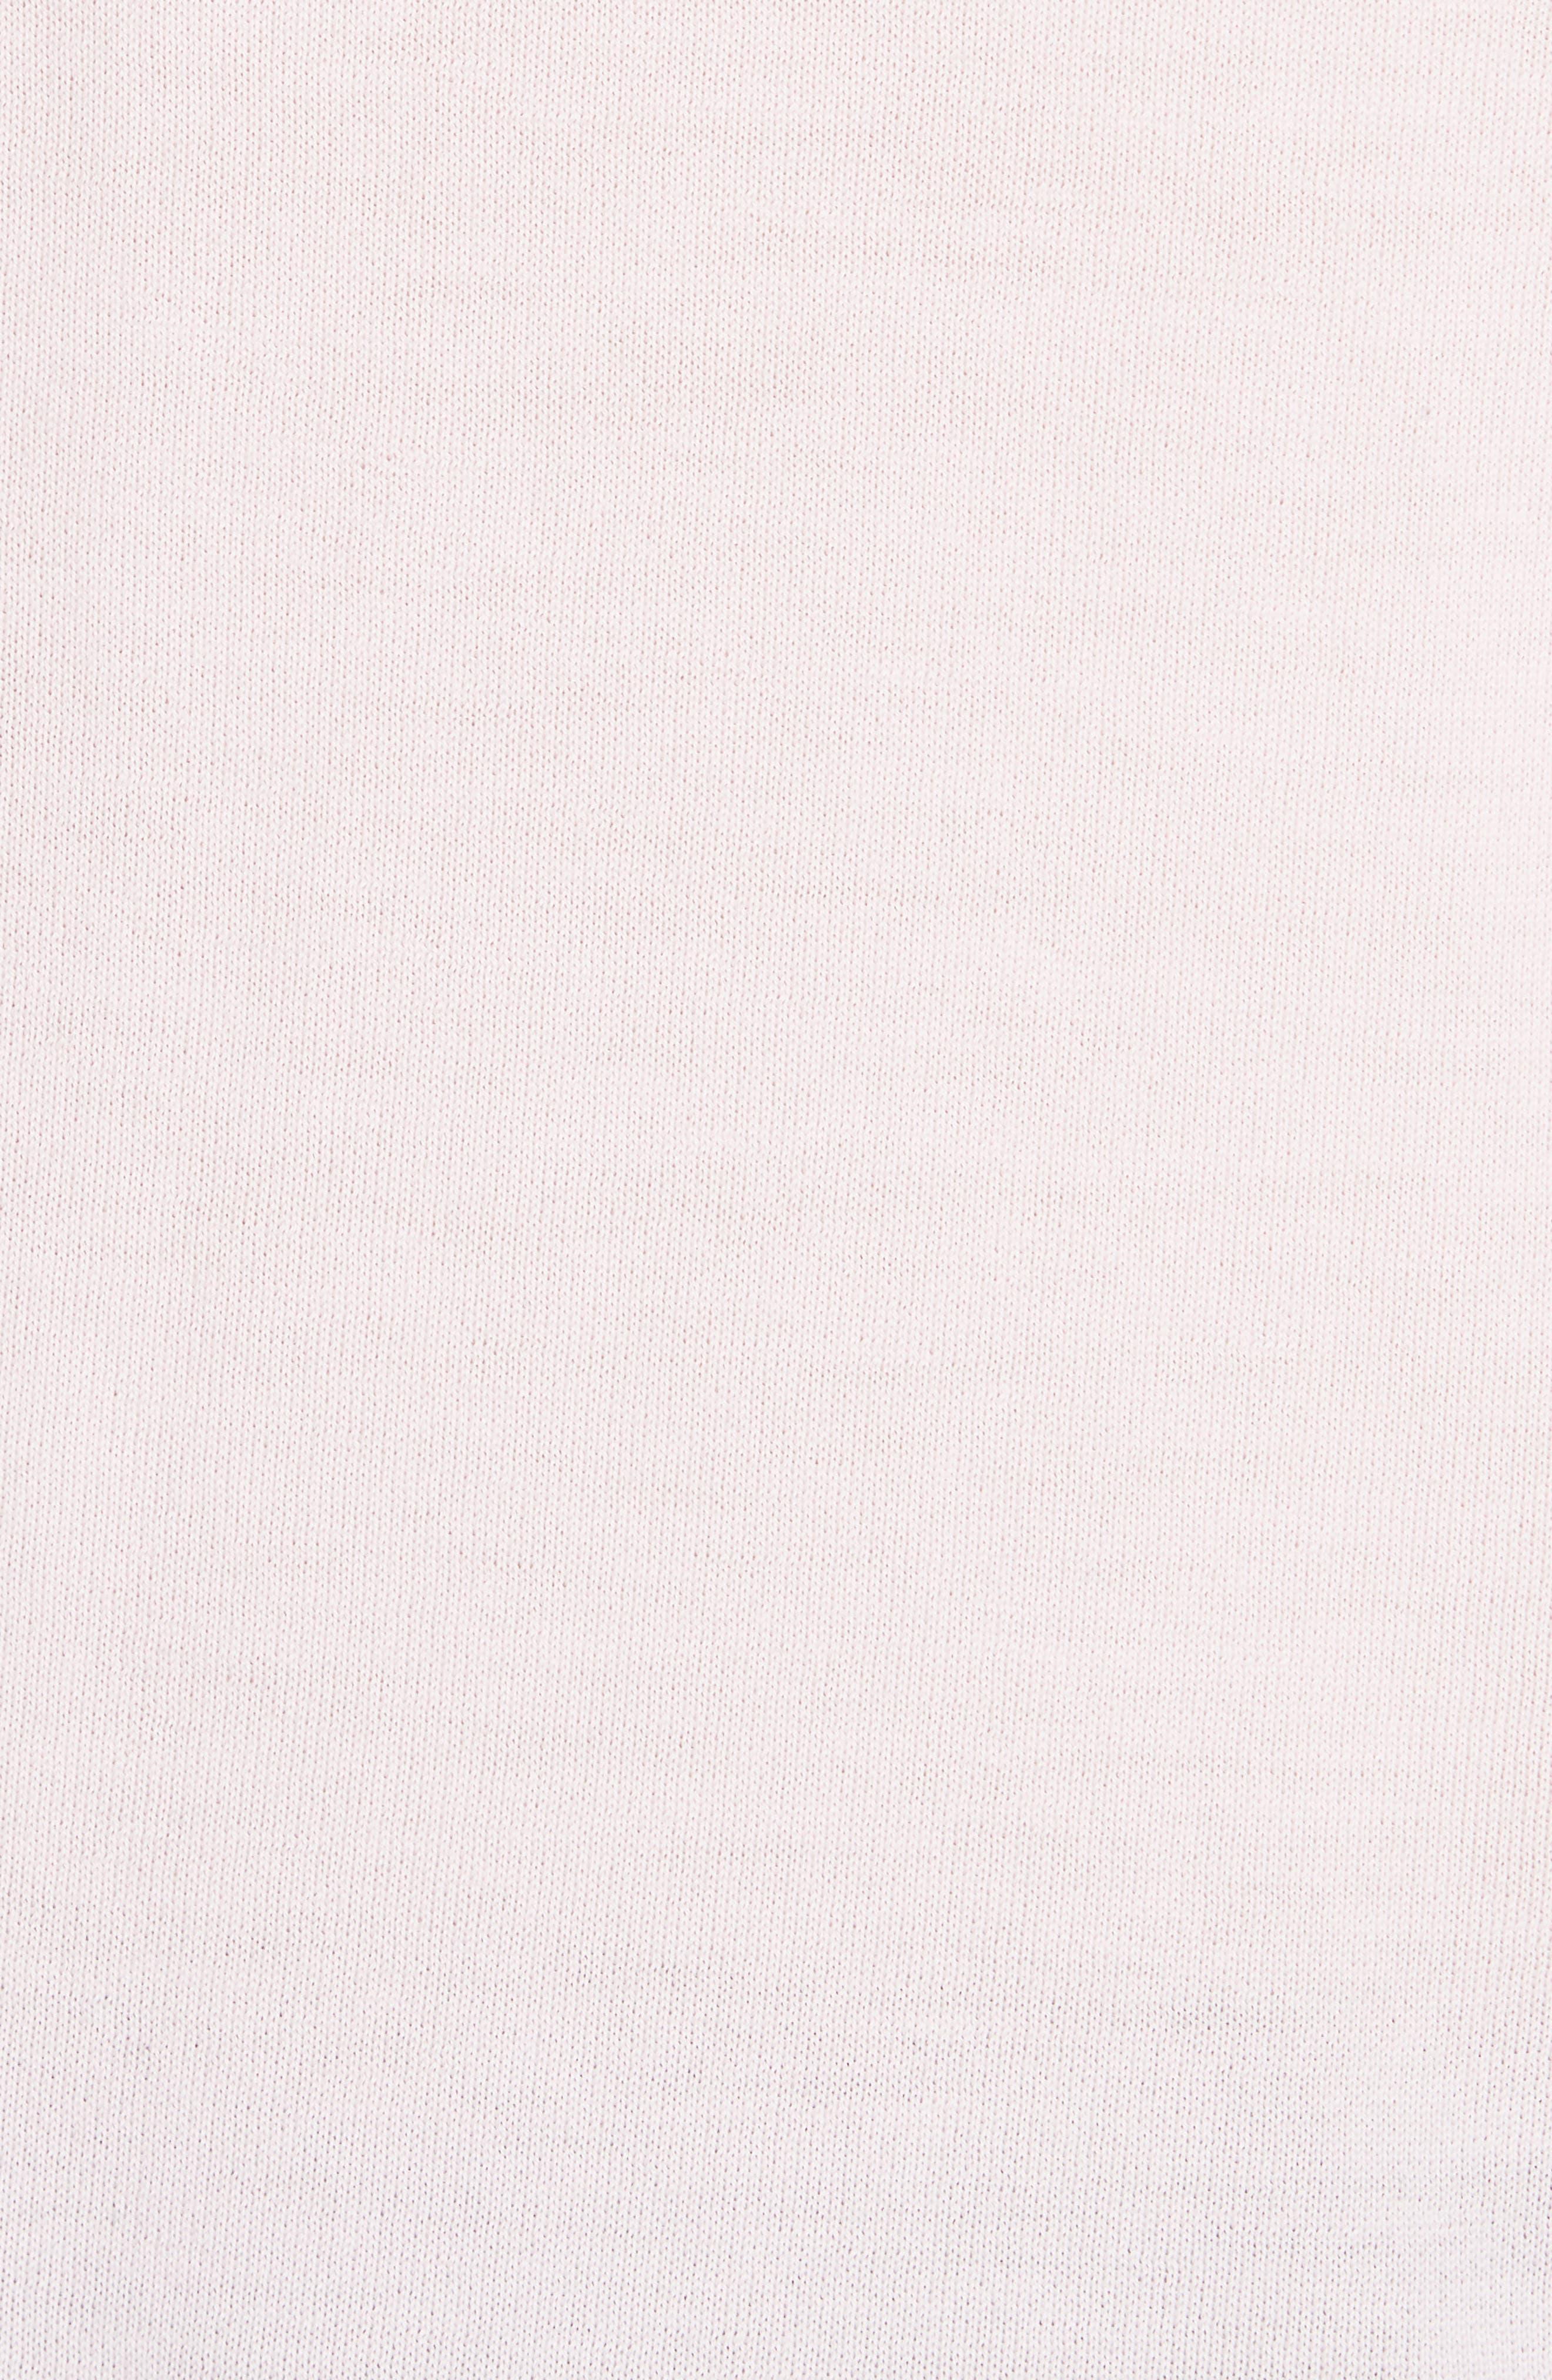 Viar Merino Wool Sweater,                             Alternate thumbnail 5, color,                             Light Pink